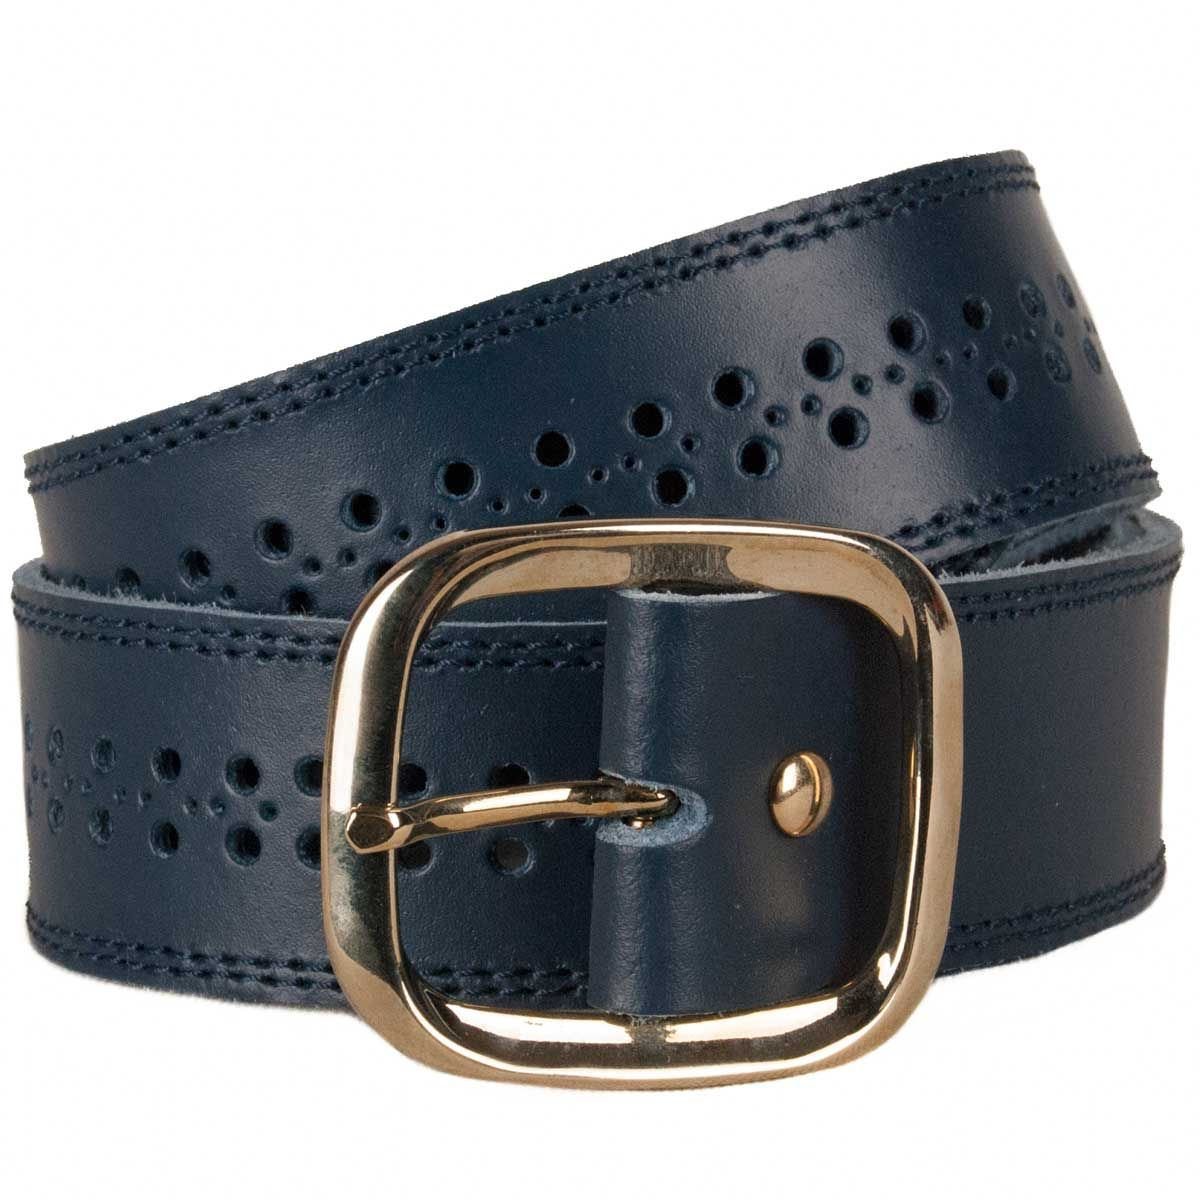 Montevita Casual Quality Belt in Blue